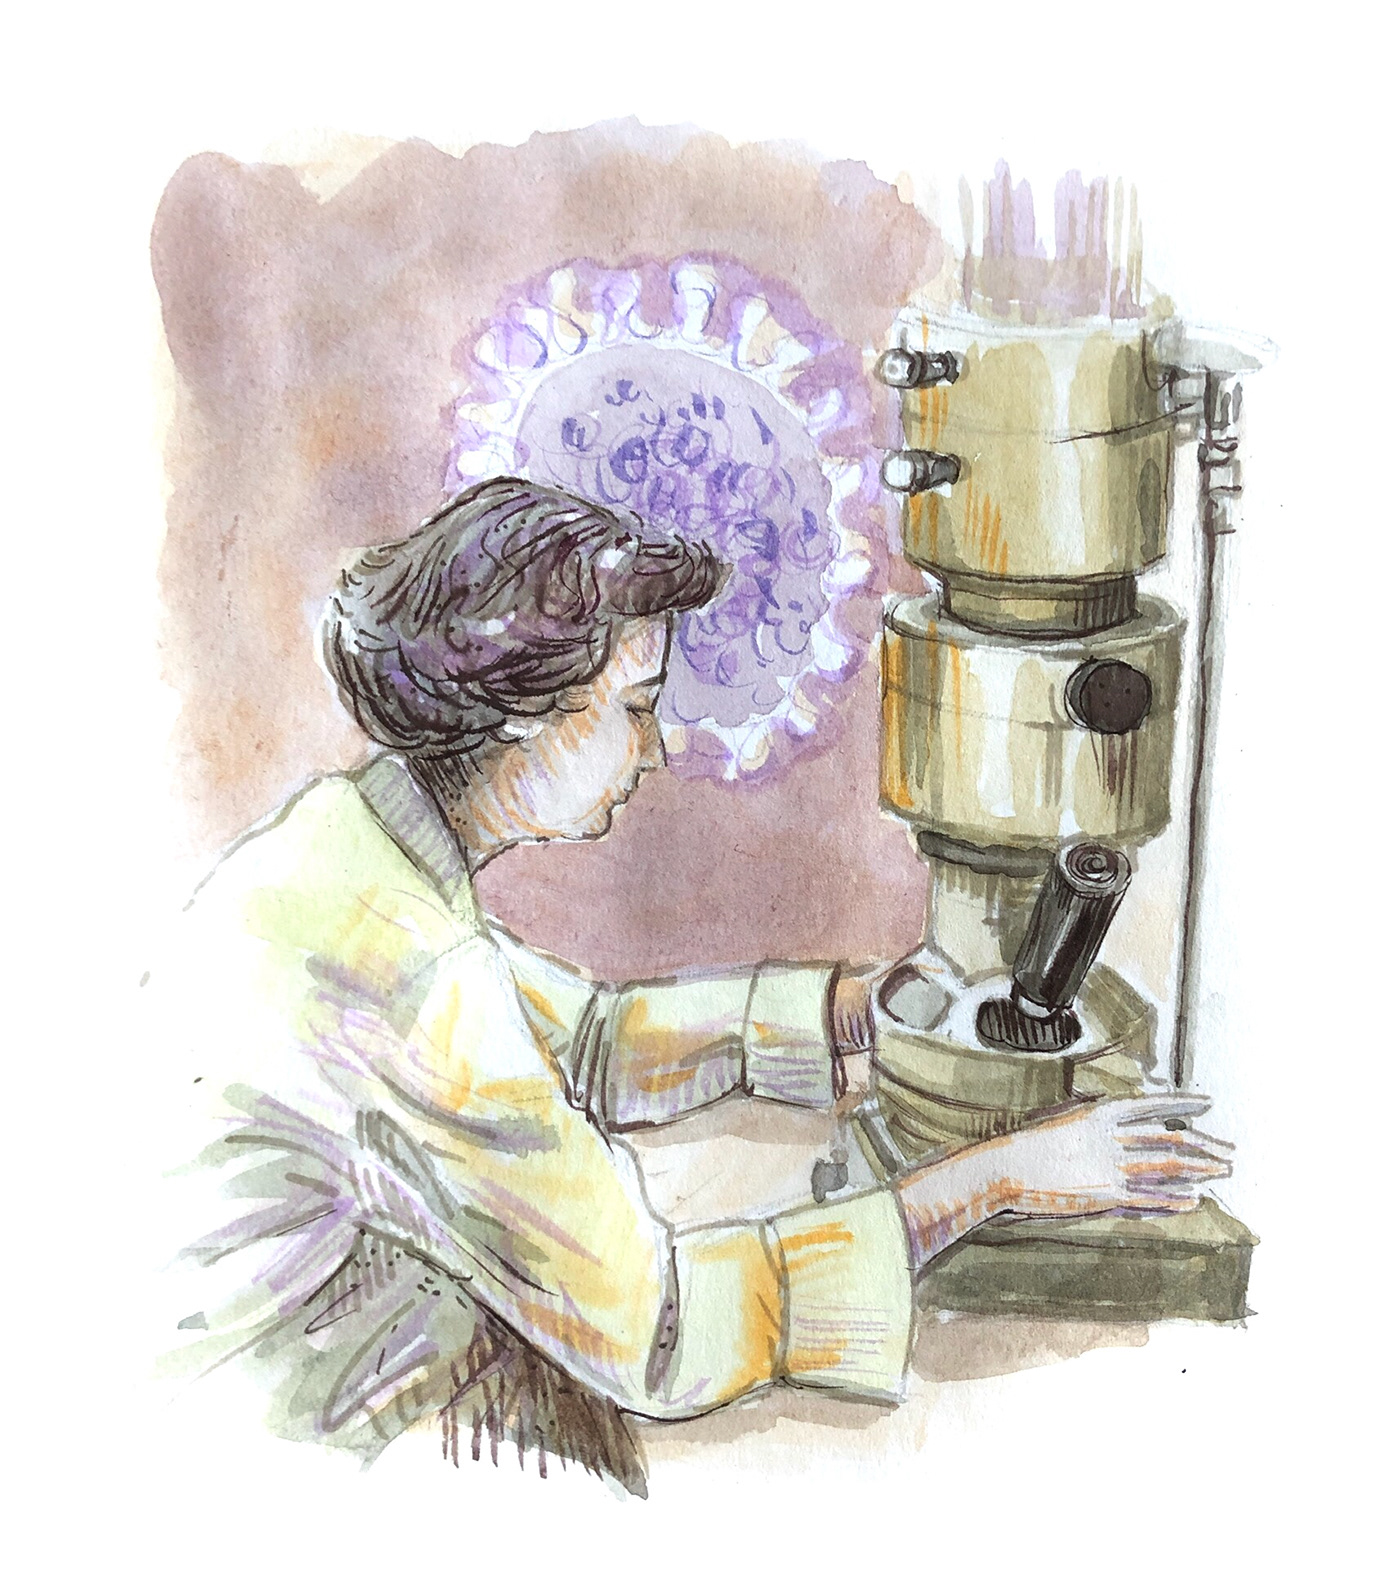 Editorial Illustration scientist portraits scientists illustrated watercolor illustration watercolor portraits  women scientists